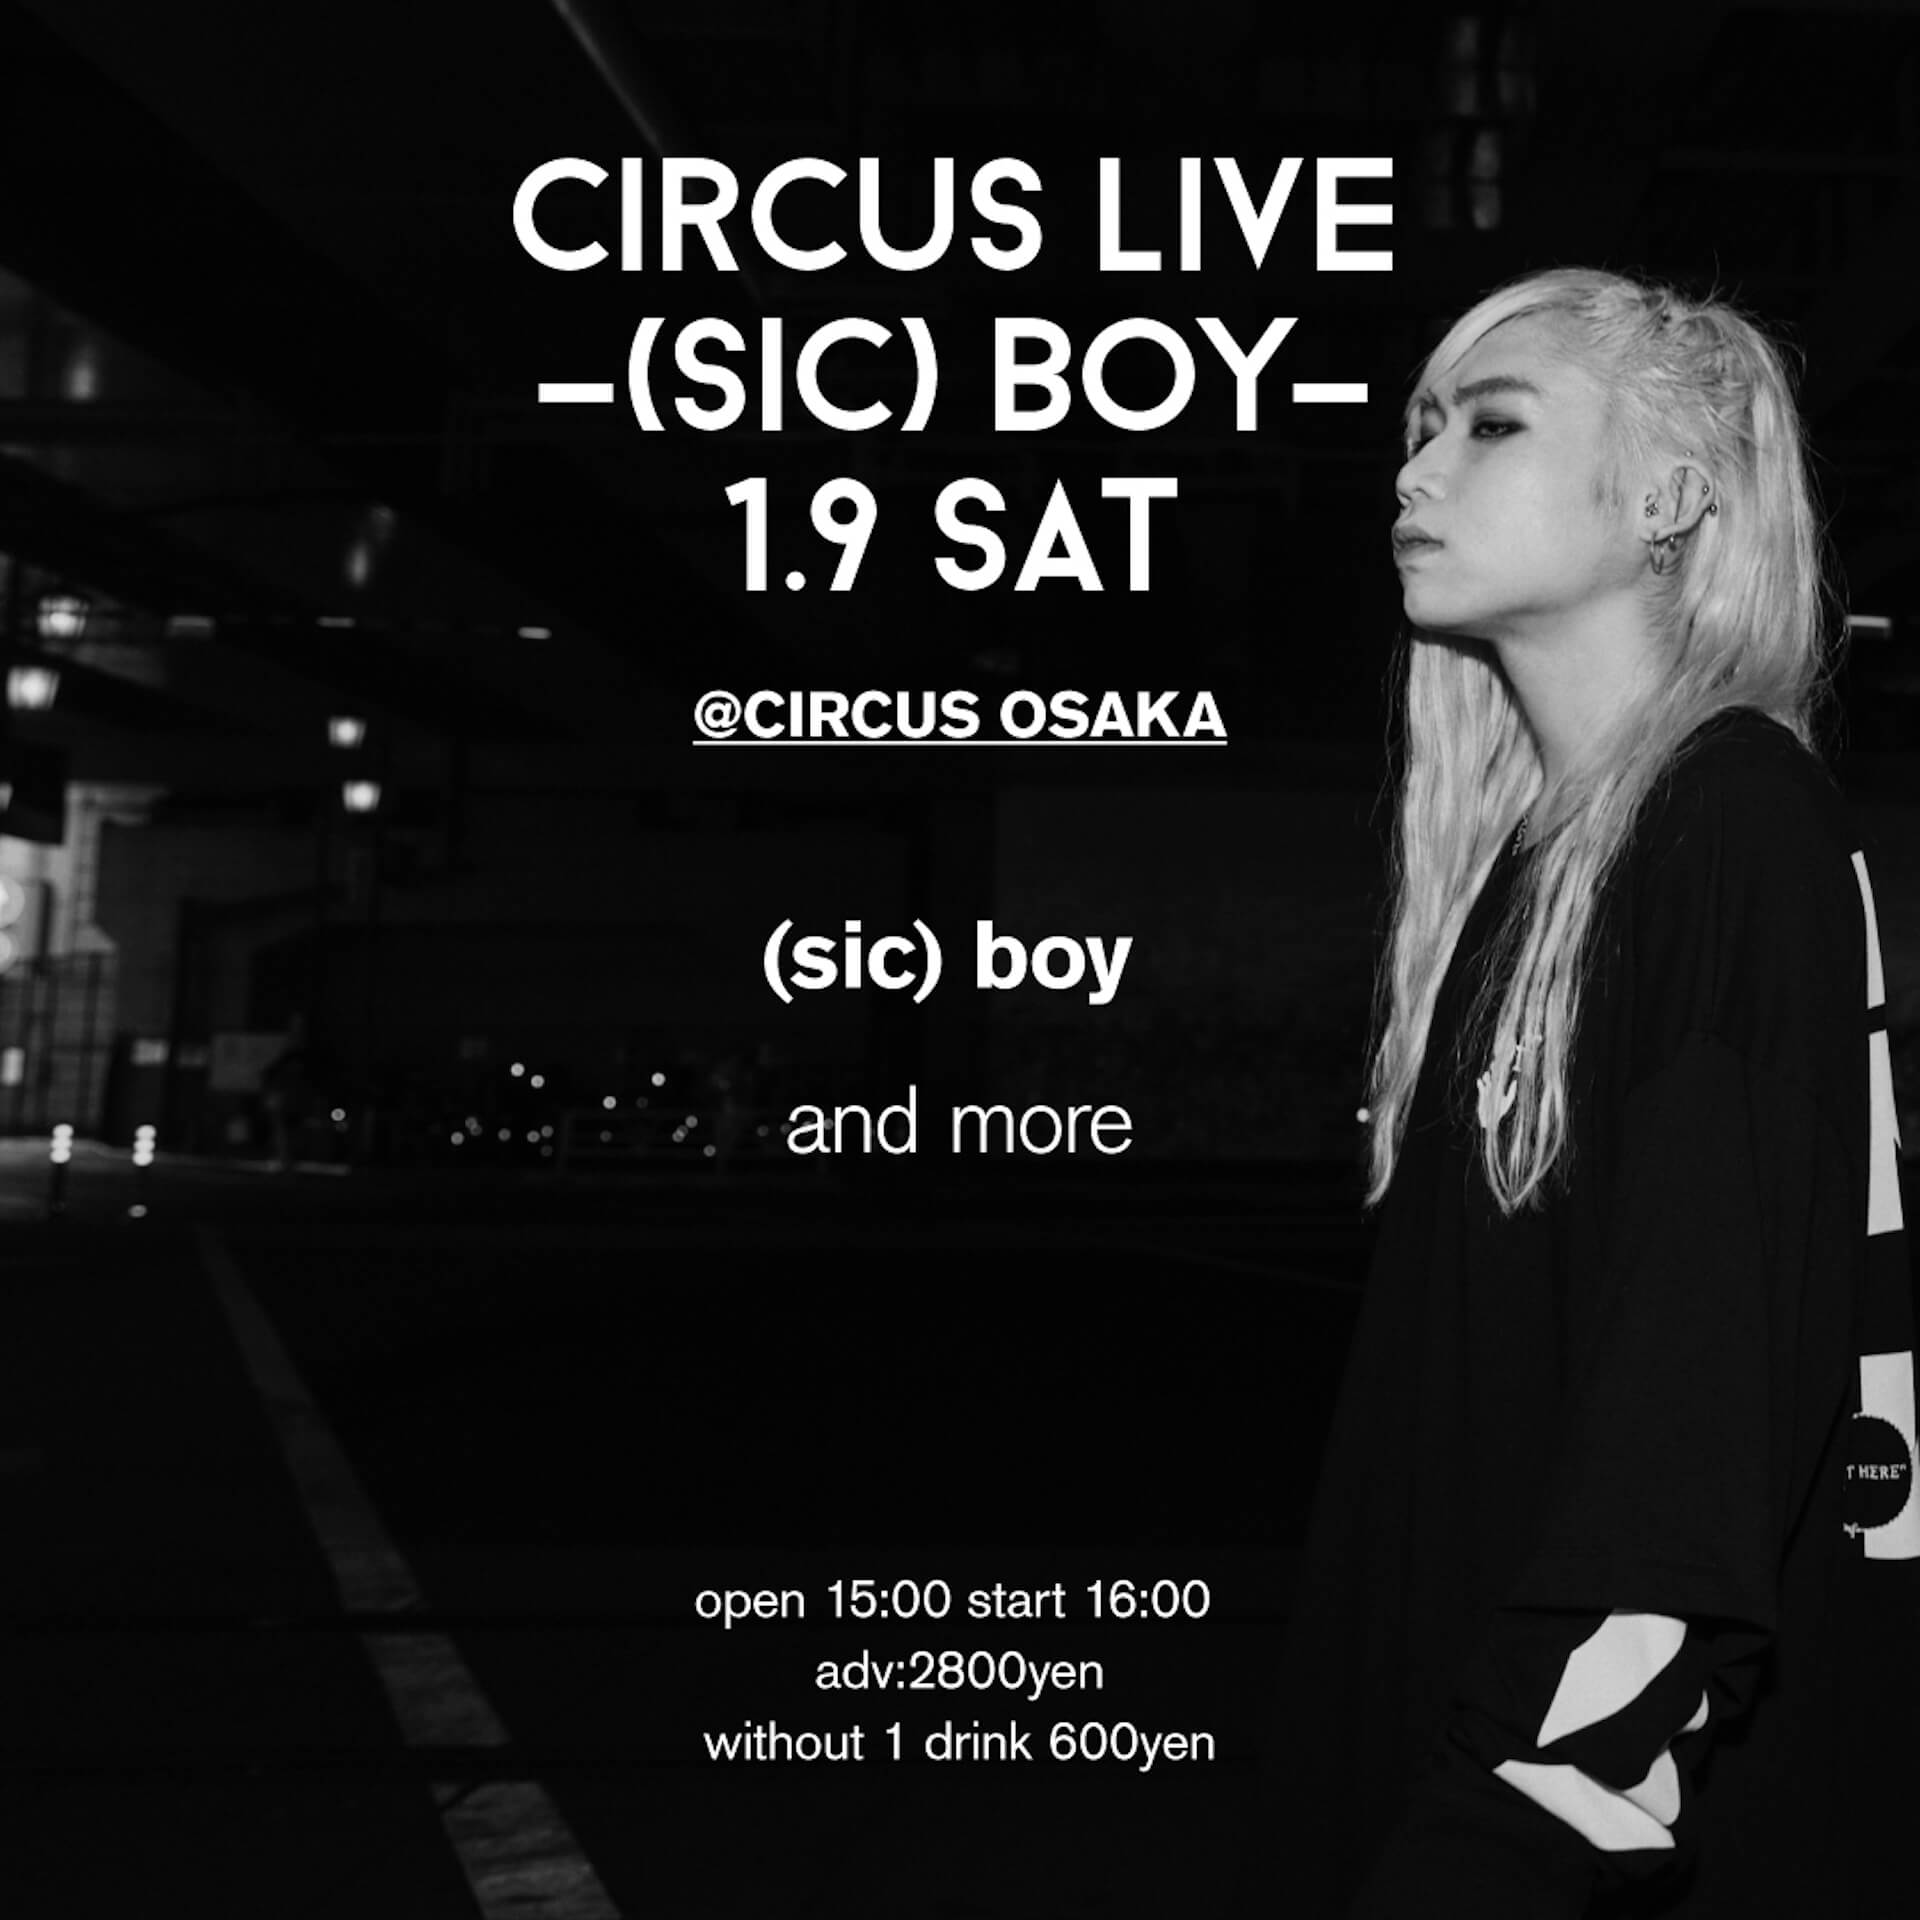 <CIRCUS LIVE-(sic)boy->がCIRCUS OSAKAにて開催決定!枚数限定のチケットも発売中 music201210_sicboy_circus_3